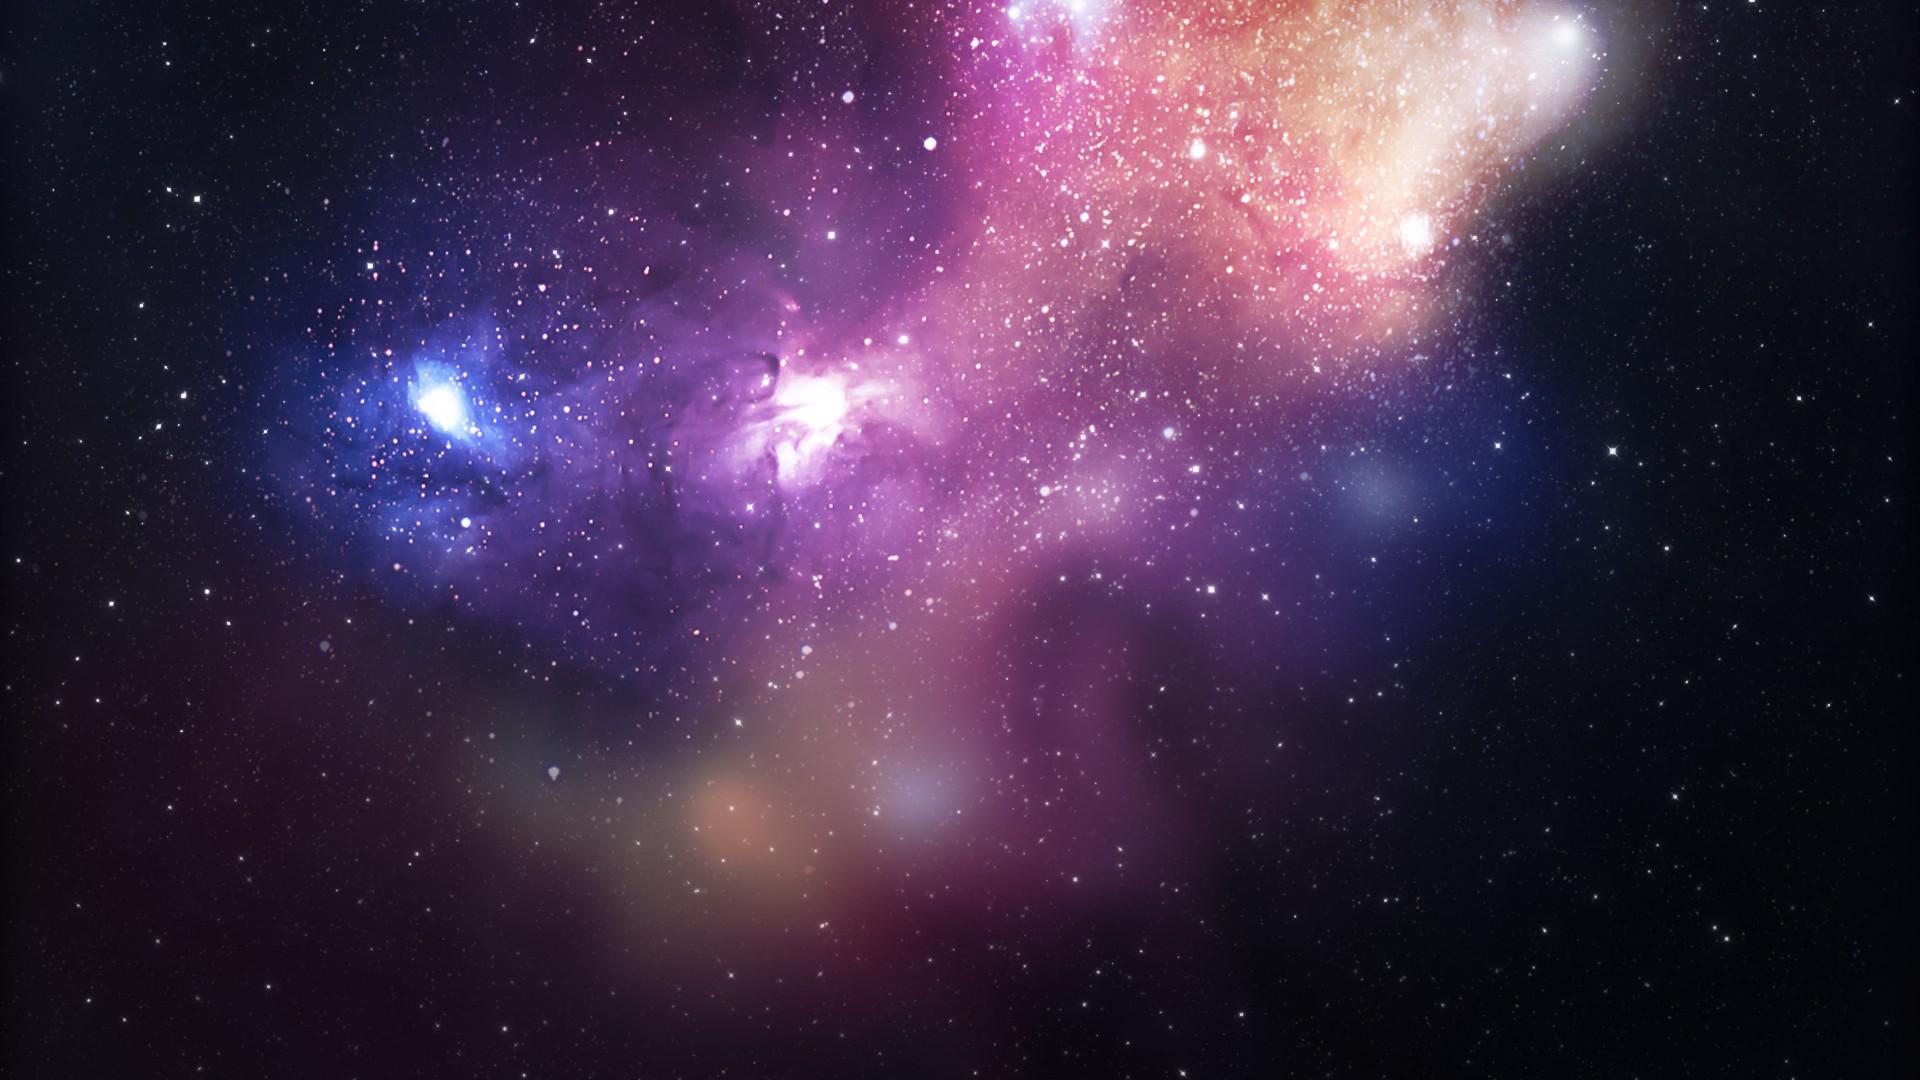 144797 space background tumblr 1920x1080 laptop